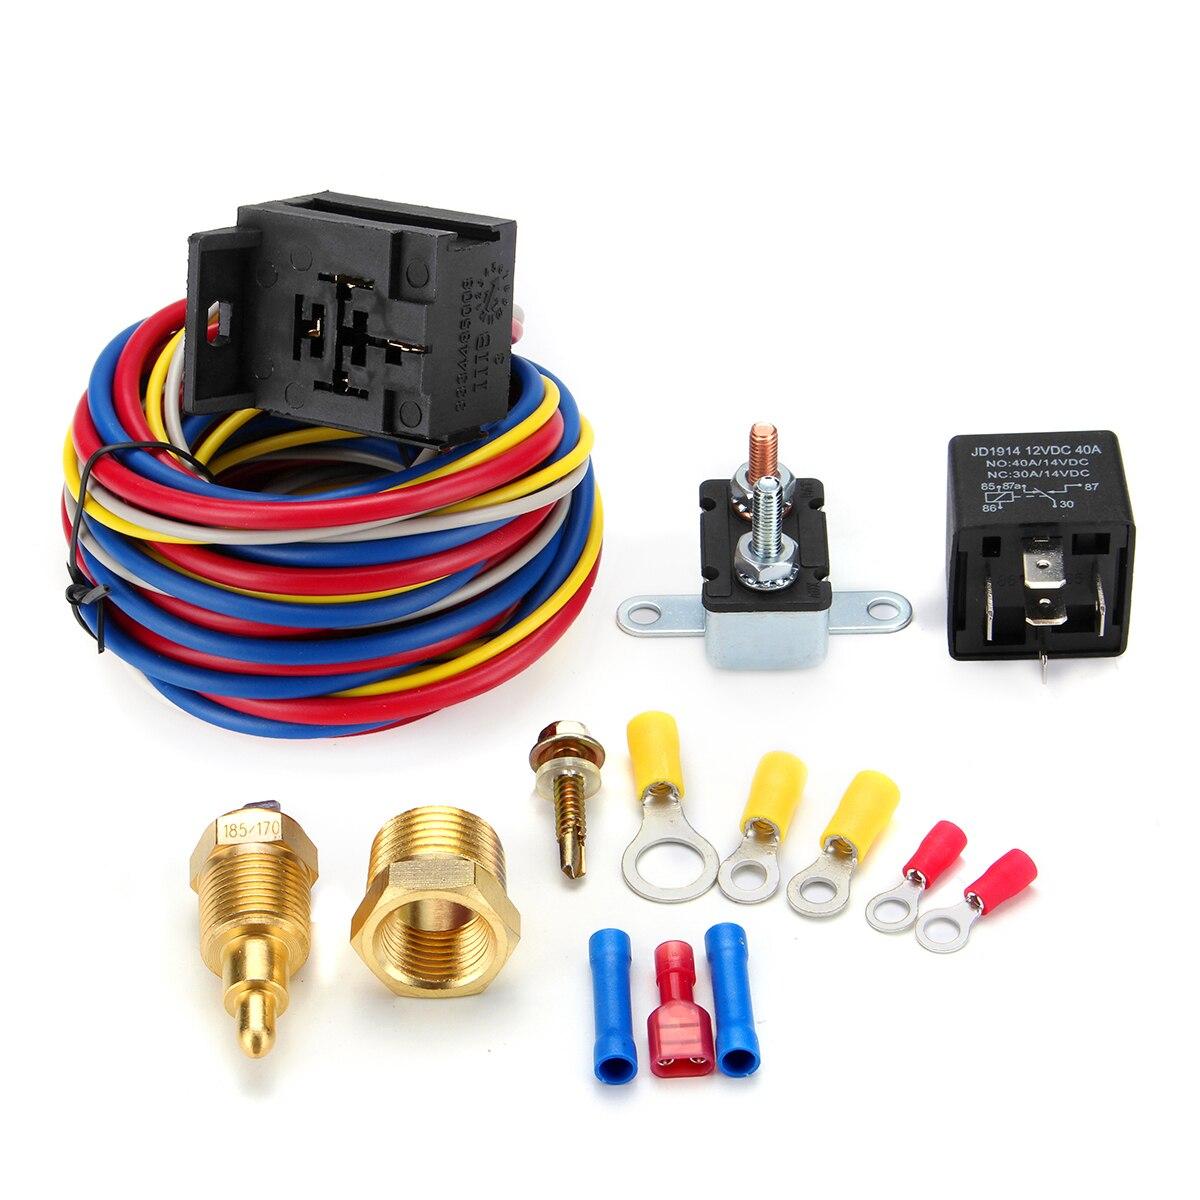 Sale Heavy Duty Auto Car Electric Fan Wiring Install Kit 185 170 Degree Thermostat Sensor 40a